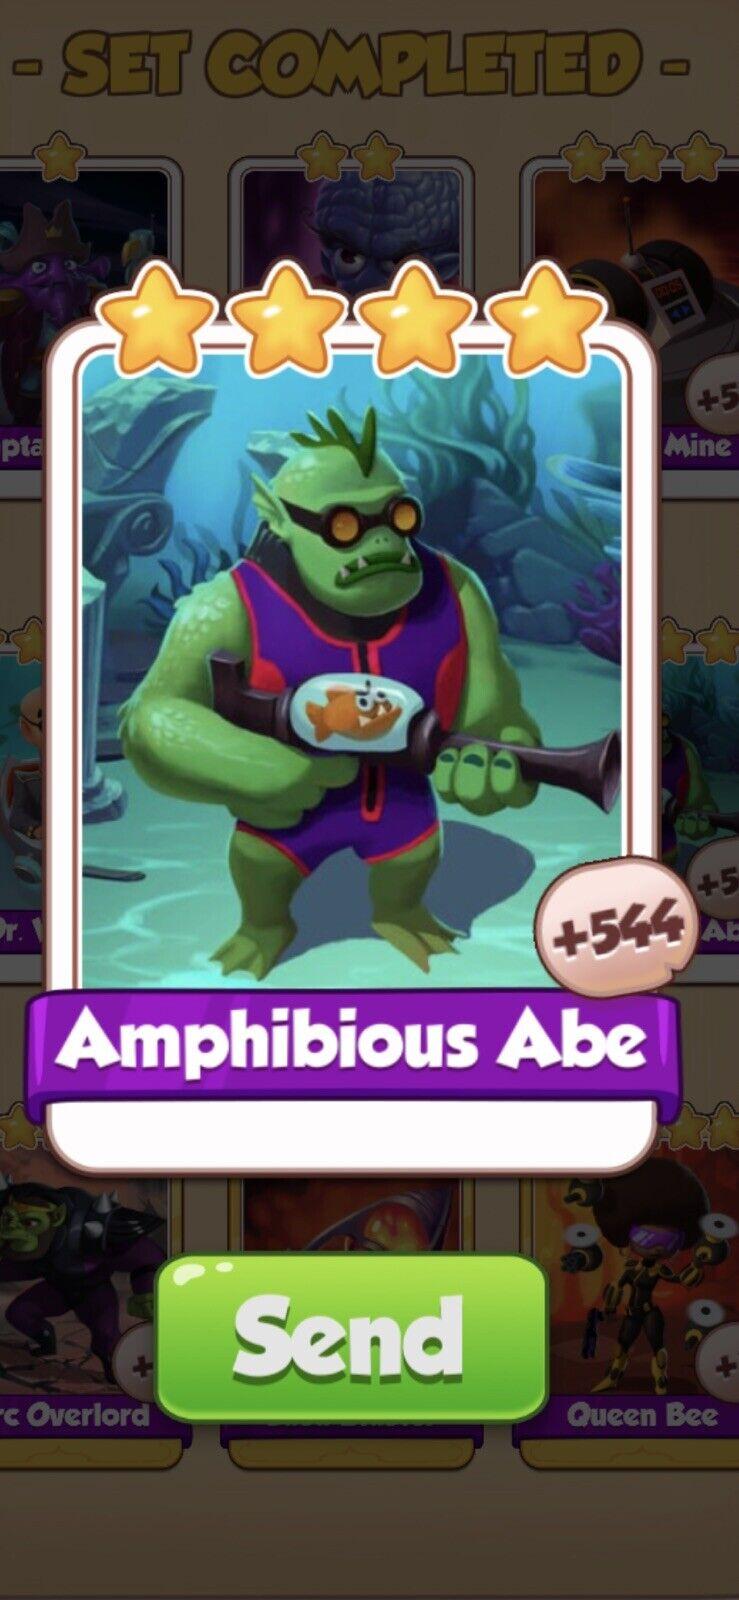 Coin Master Supervillains, Amphibious Abe Card (Fast Sending)